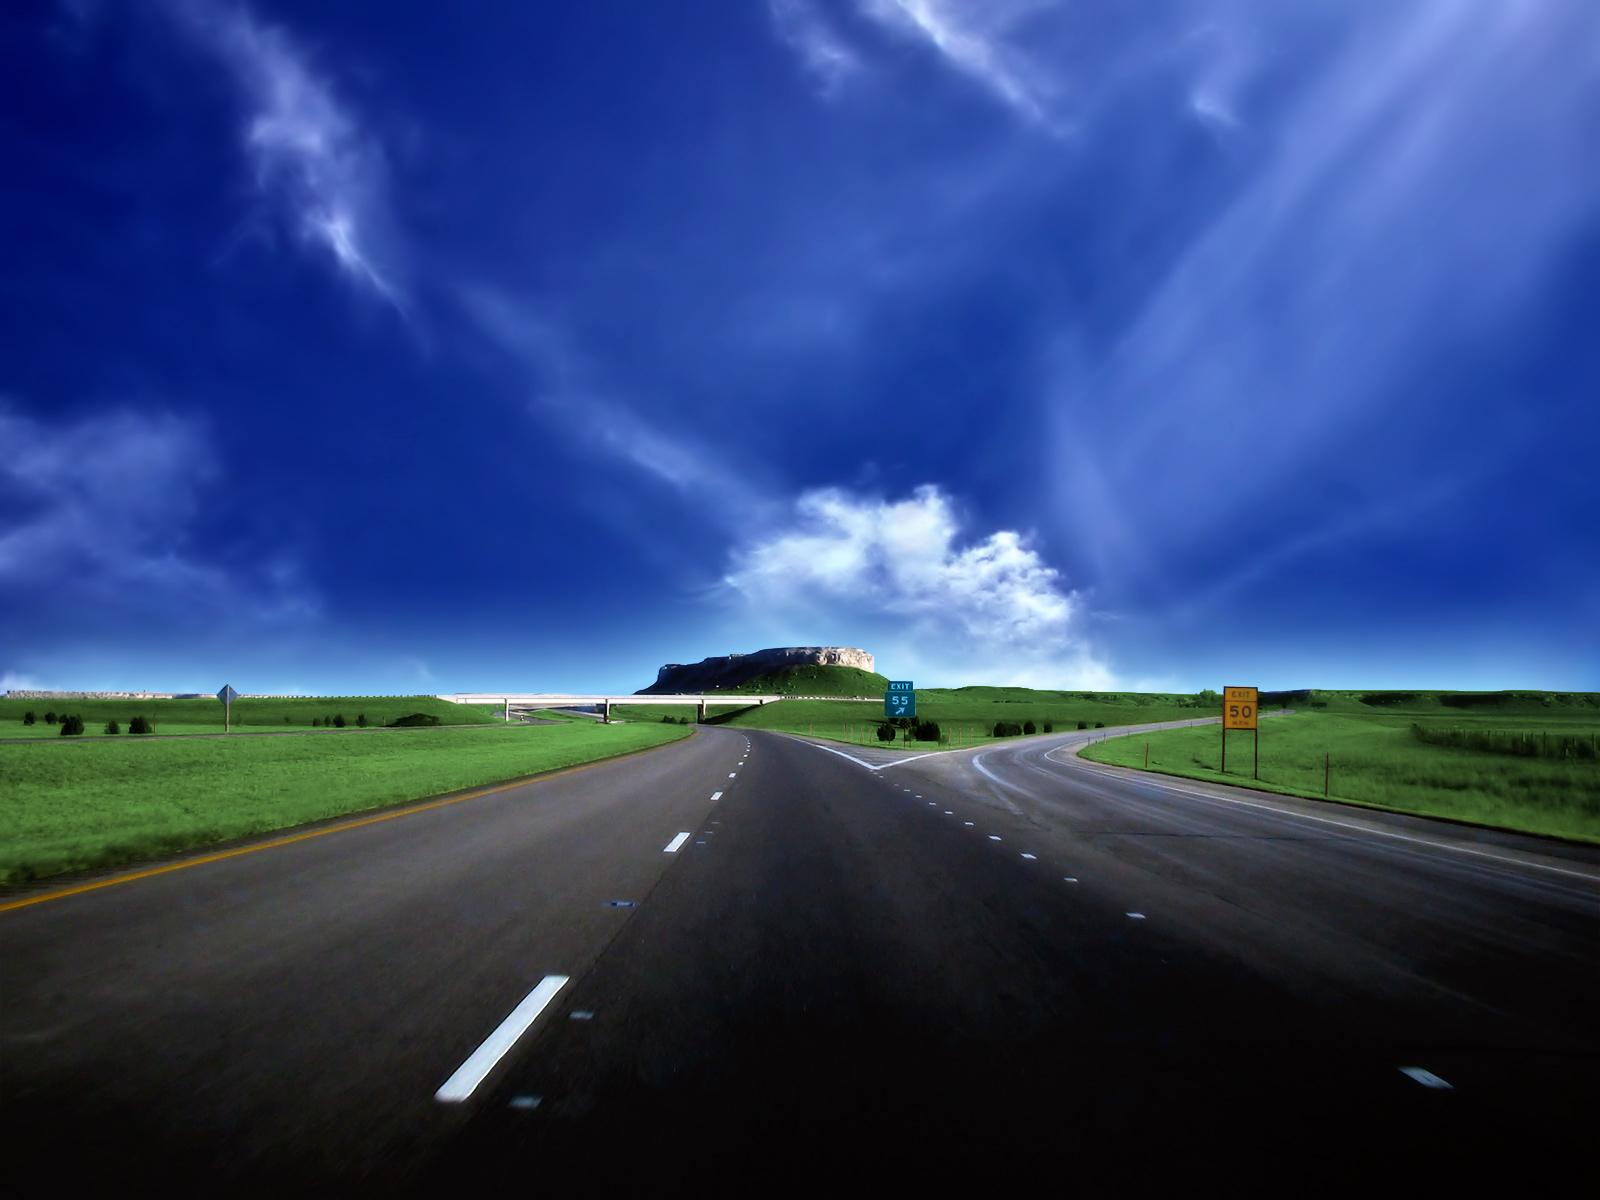 http://4.bp.blogspot.com/-LZlc4M_k0Mg/TYXKKi1KPPI/AAAAAAAAHKI/jTbY5T-D4Yc/s1600/1-Roads-Wallpapers-1920x1200-1600-Roads%2BWallpapers-%2BFree-Desktop-Roads-Wallpapers-Roads%2B-%2BNature-Landscapes-wallpaper-Free-Quality-Desktop-Amazing-Roads-Wallpapers-Hot